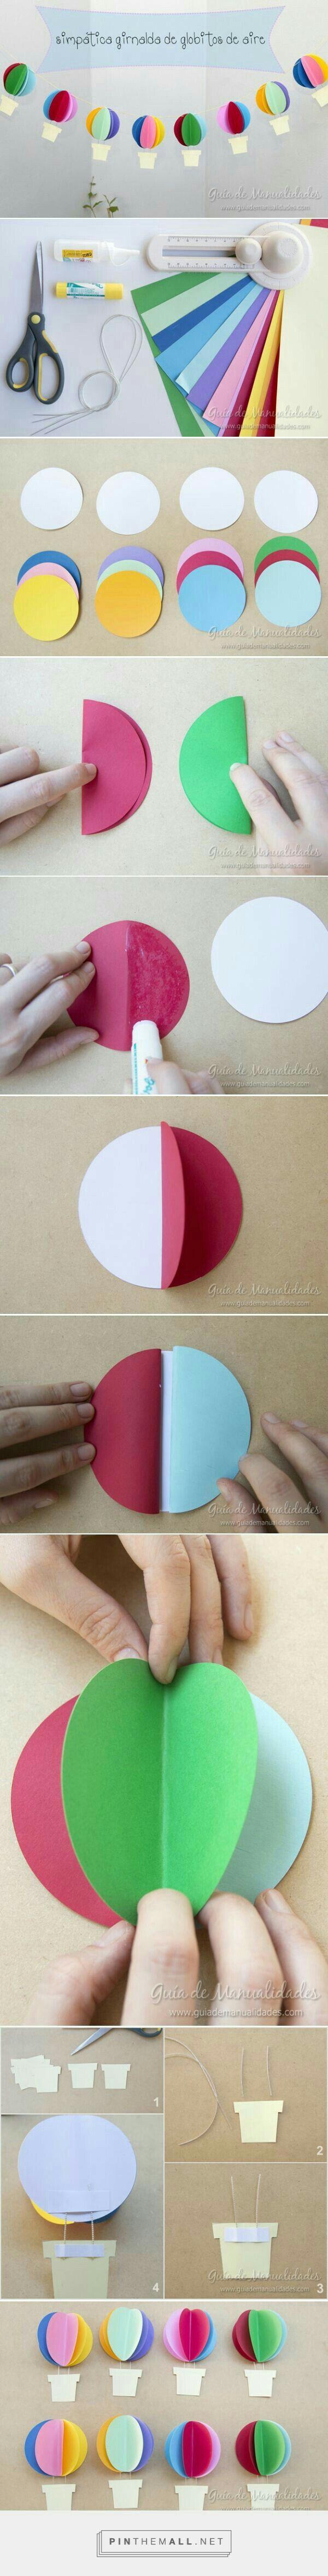 Pallone di carta